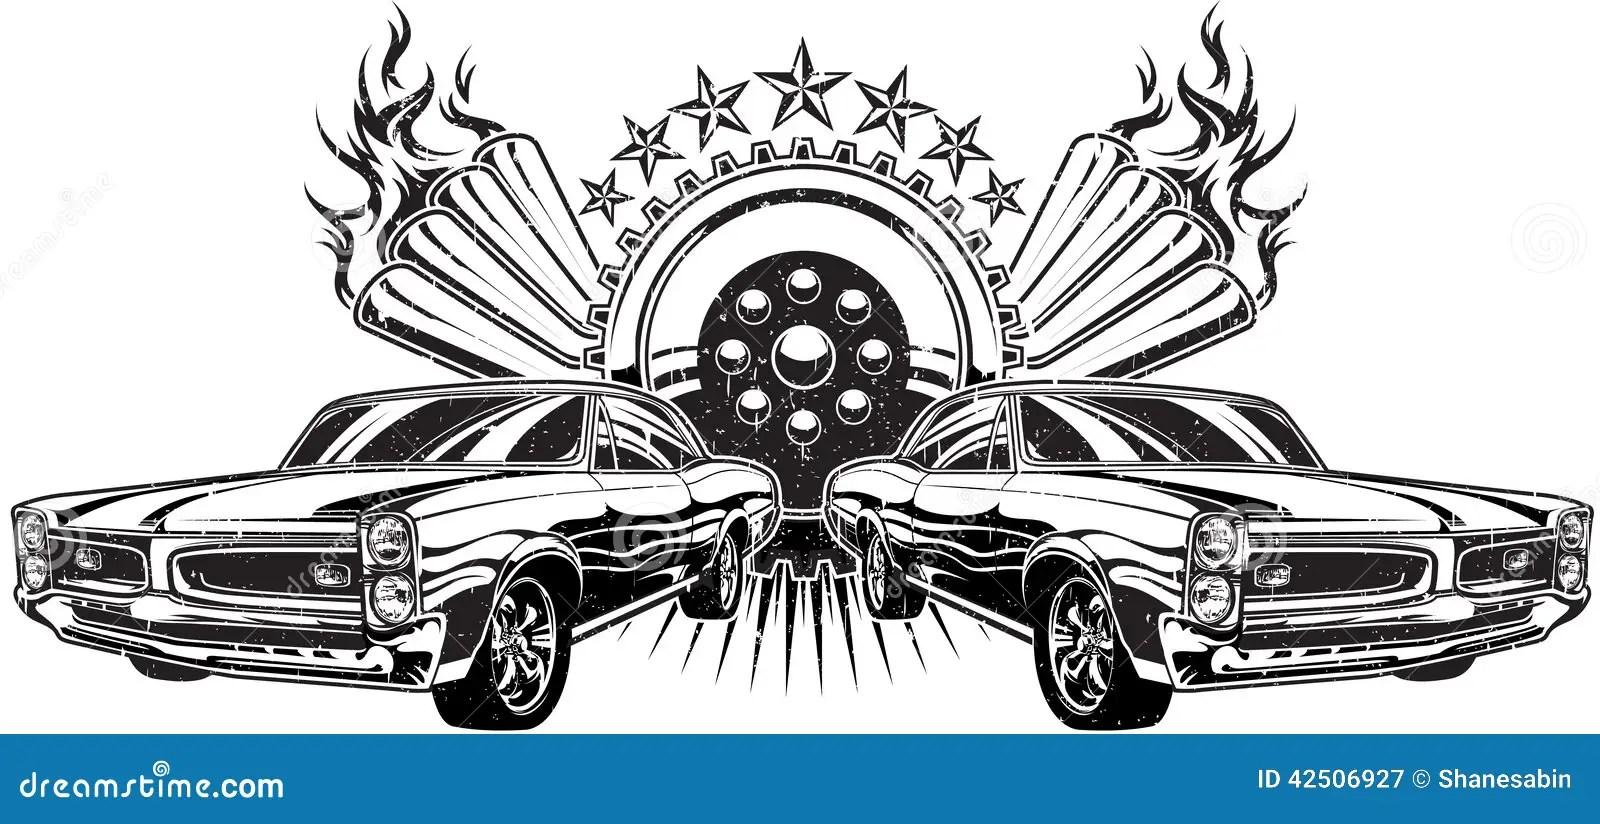 Drag Race Illustration stock vector. Illustration of